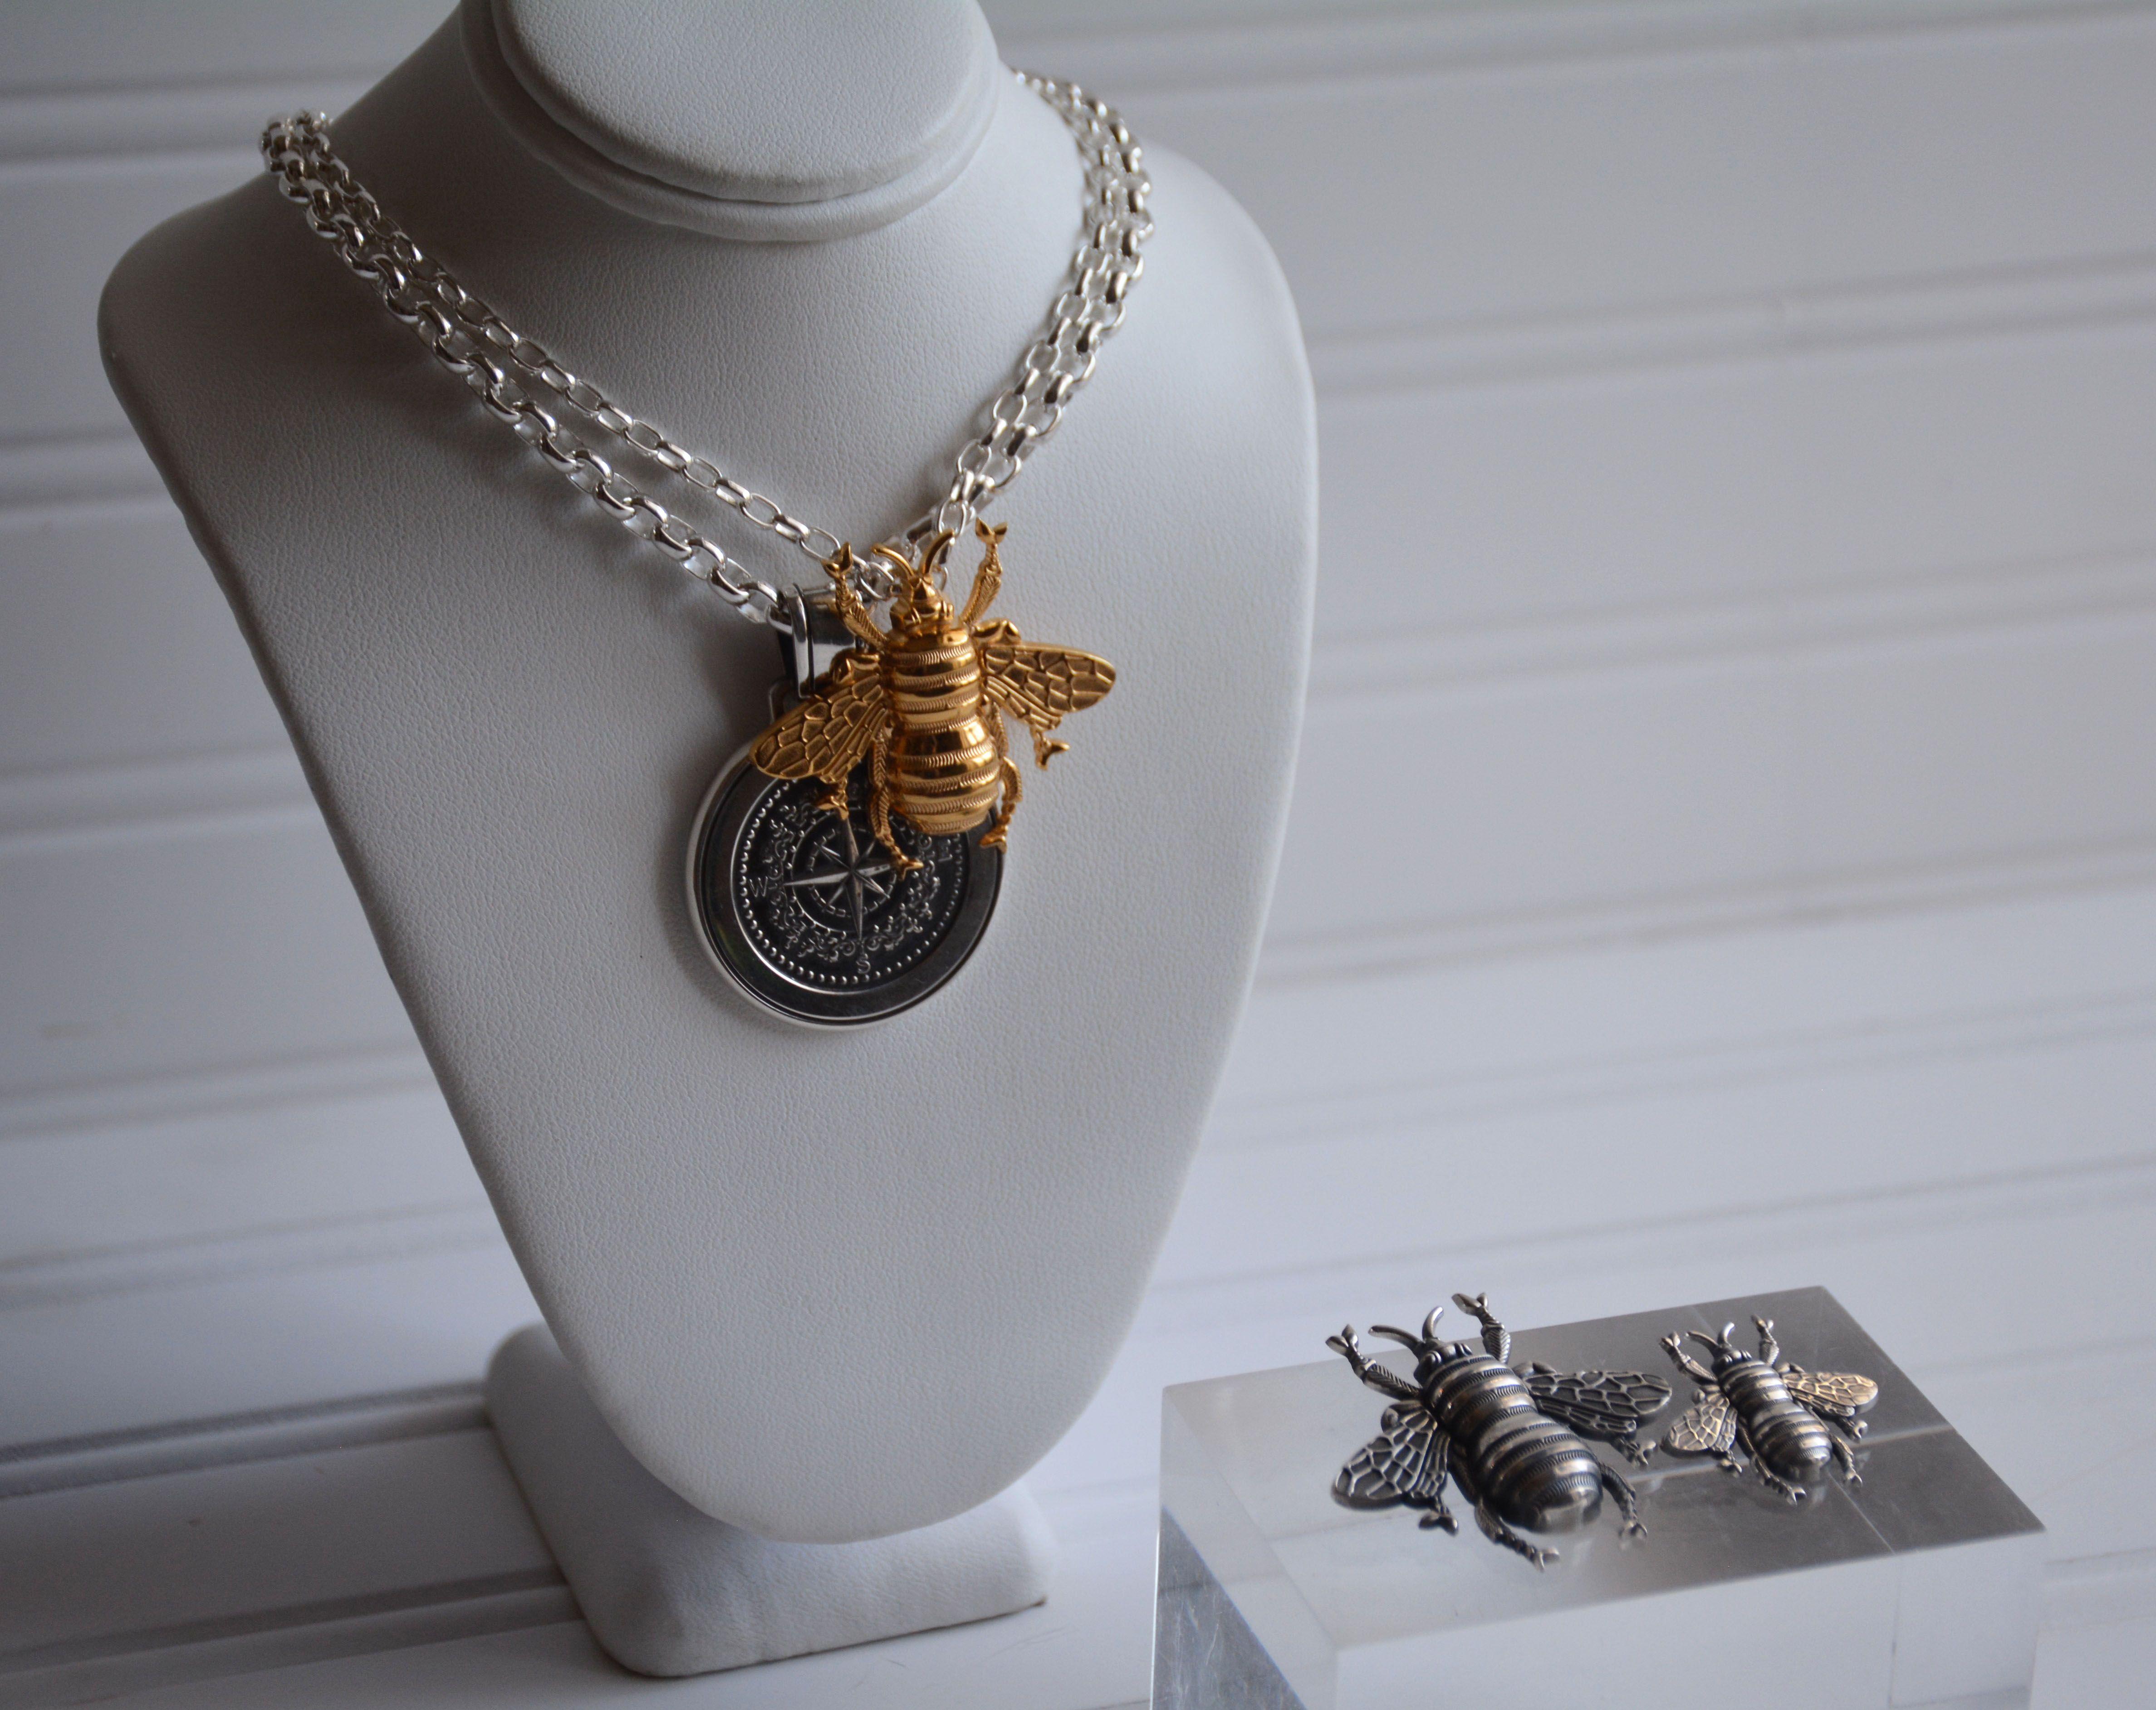 New Bee Collection Beekind Beegood Beehappy Colbydavis Statement Necklace Pendant Necklace Pendant